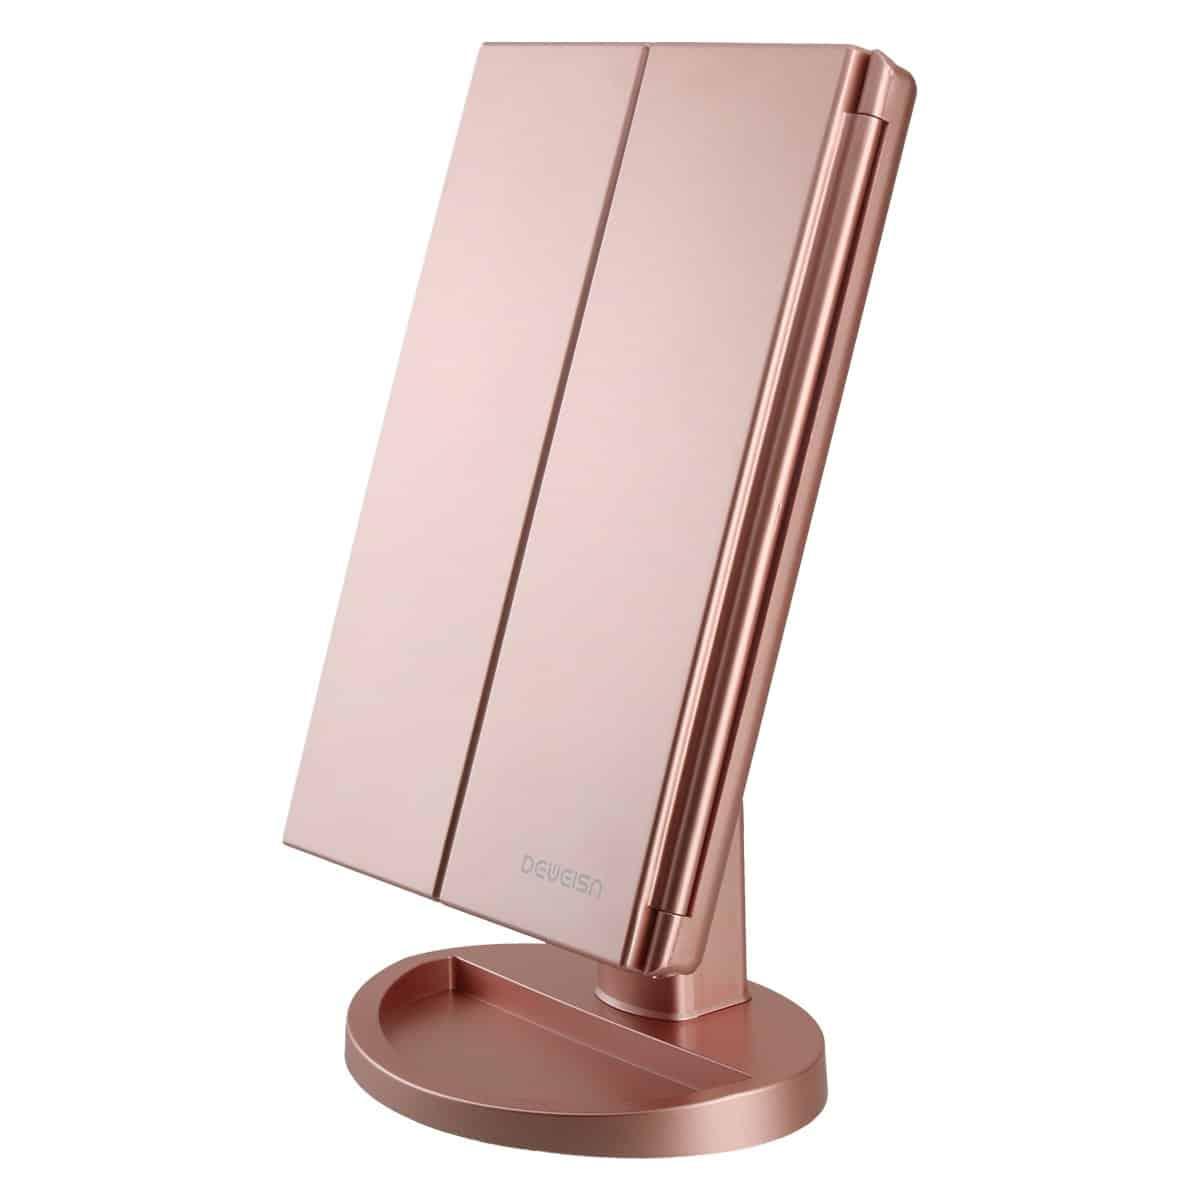 Deweisn Tri-Fold Vanity Makeup Mirrors